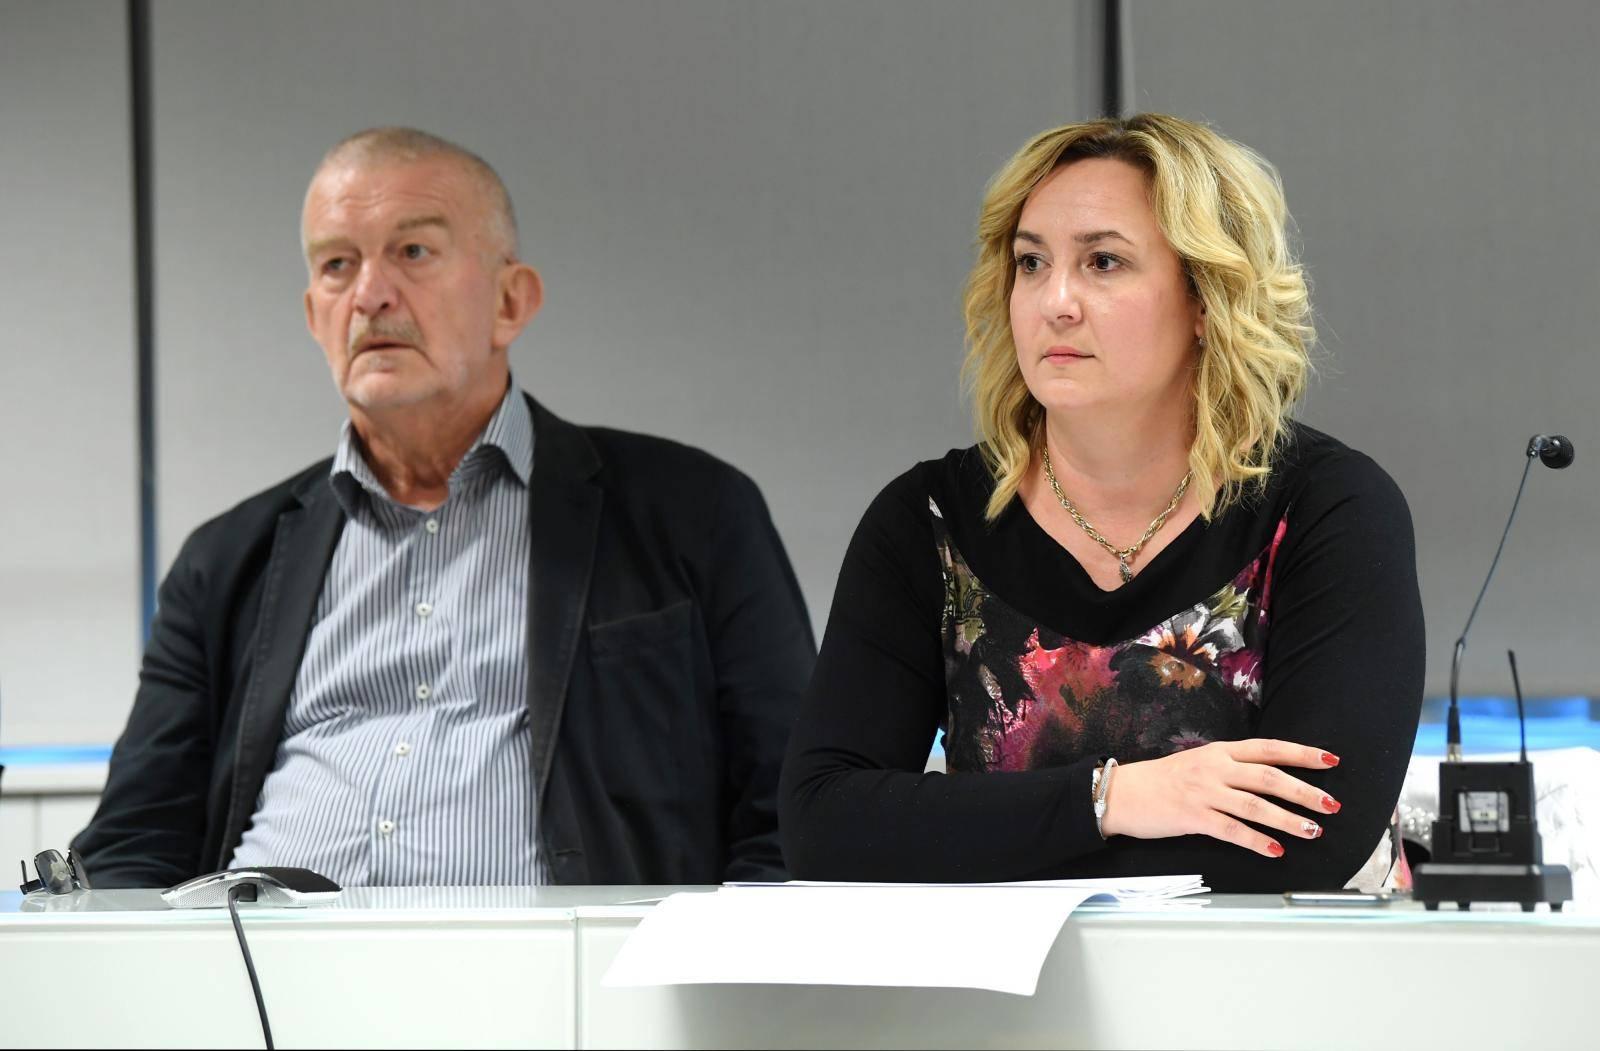 Zagreb: Konferencija sindikalista o Å¡trajku u Å¡kolama